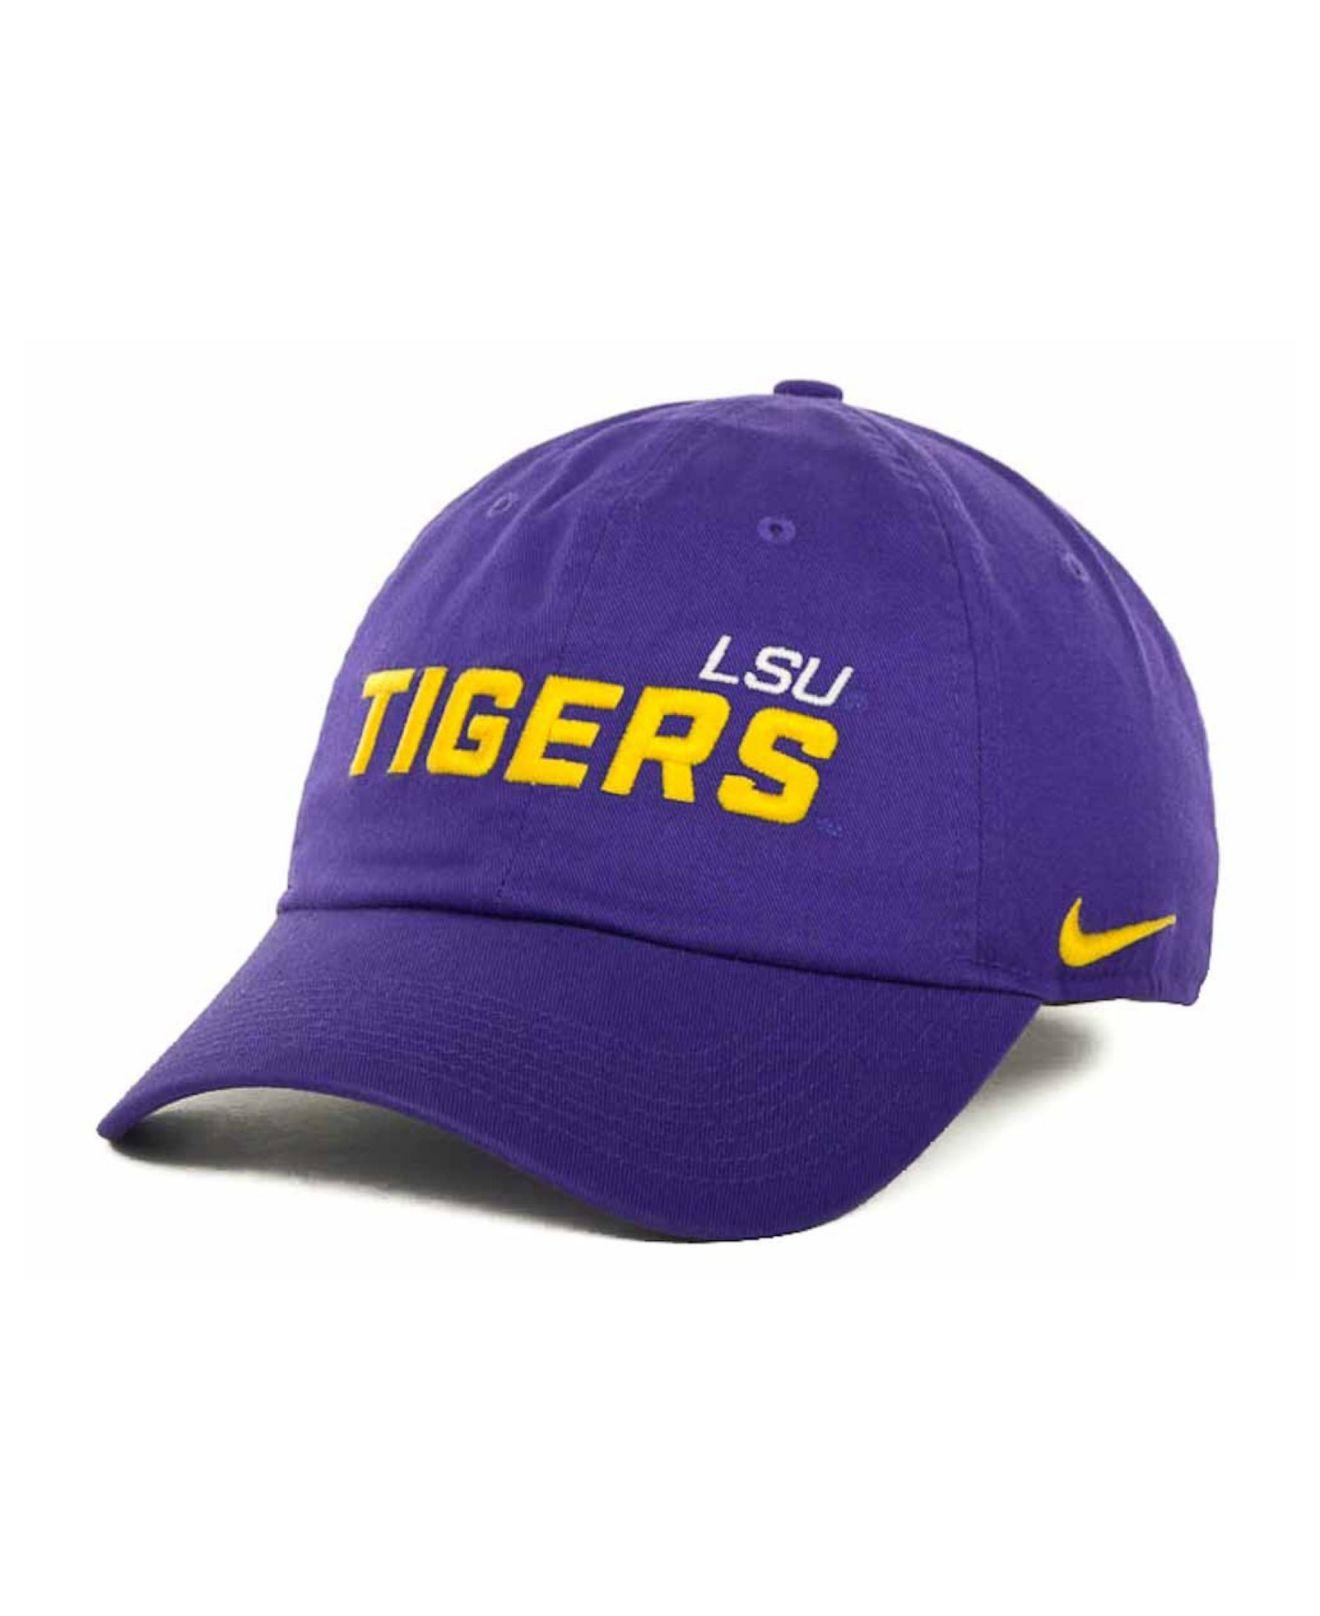 6b6591467dc Lyst - Nike Lsu Tigers Heritage 86 Campus Cap in Purple for Men